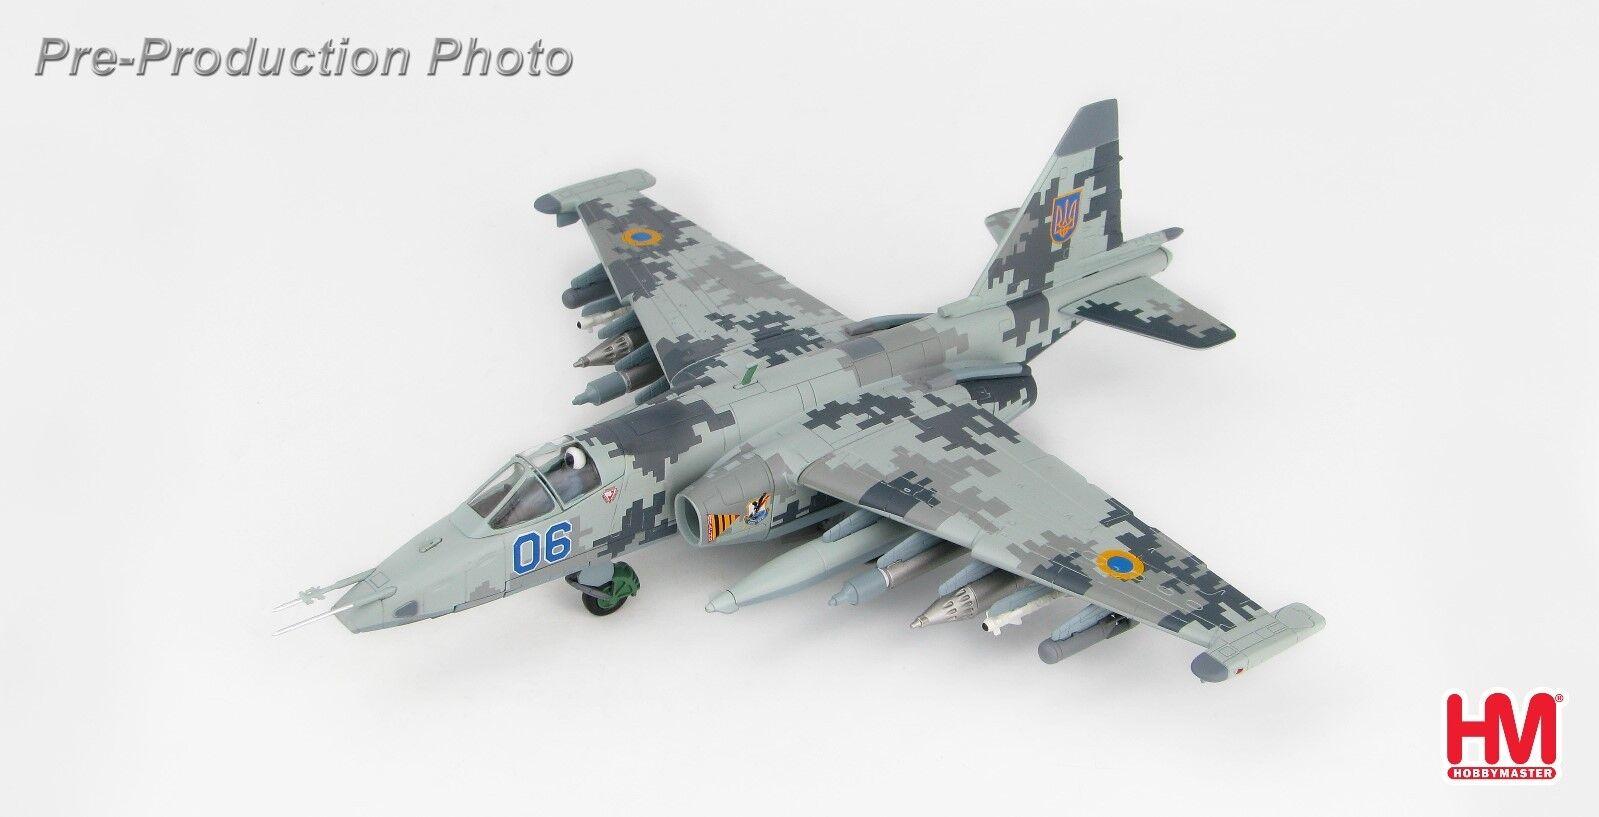 HOBBY MASTER MASTER MASTER 1/72 HA6105 Su-25M1 Frogfoot Ukranian Air Force, Nikolaev, 2014 94f232